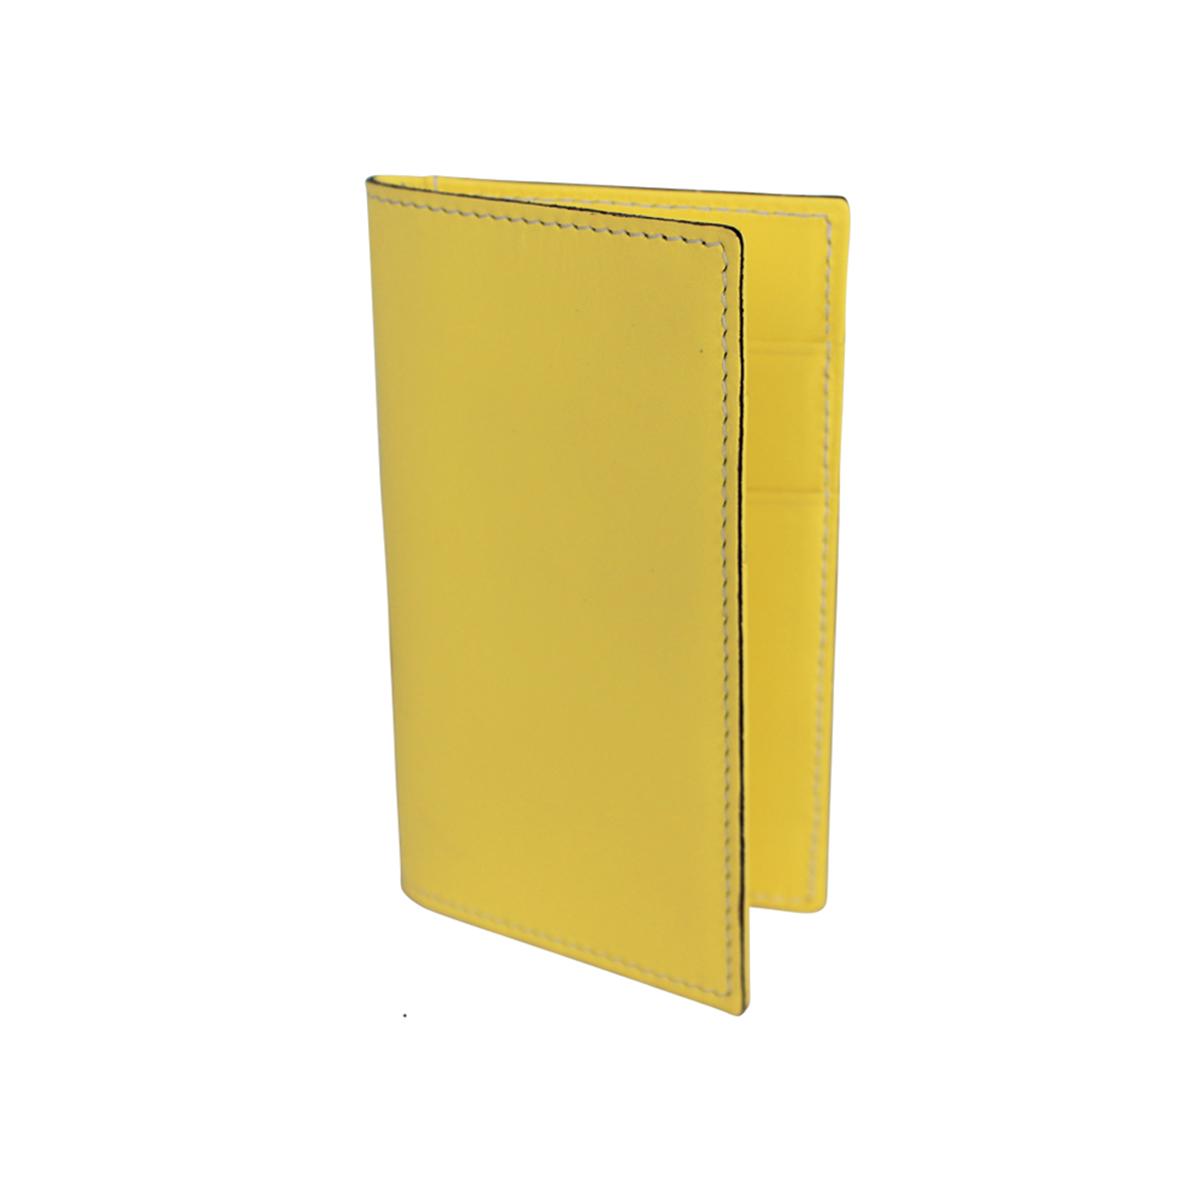 porte cartes en cuir homme jaune le site du cuir. Black Bedroom Furniture Sets. Home Design Ideas